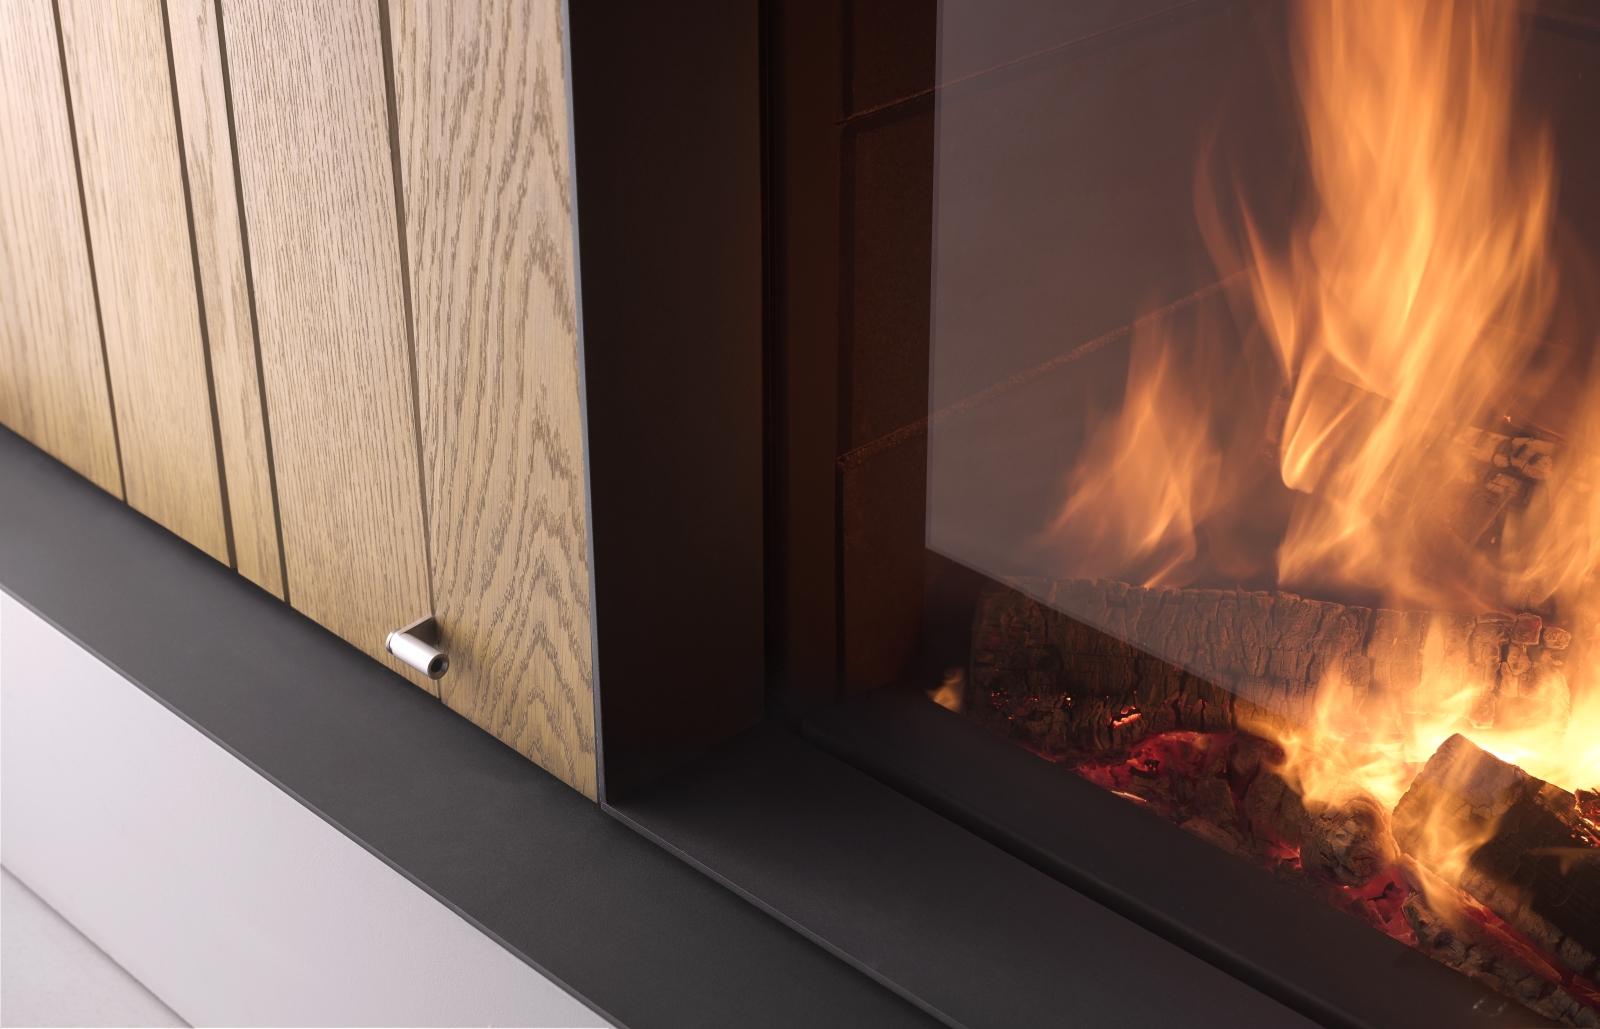 le chauffage au bois pollue t il. Black Bedroom Furniture Sets. Home Design Ideas